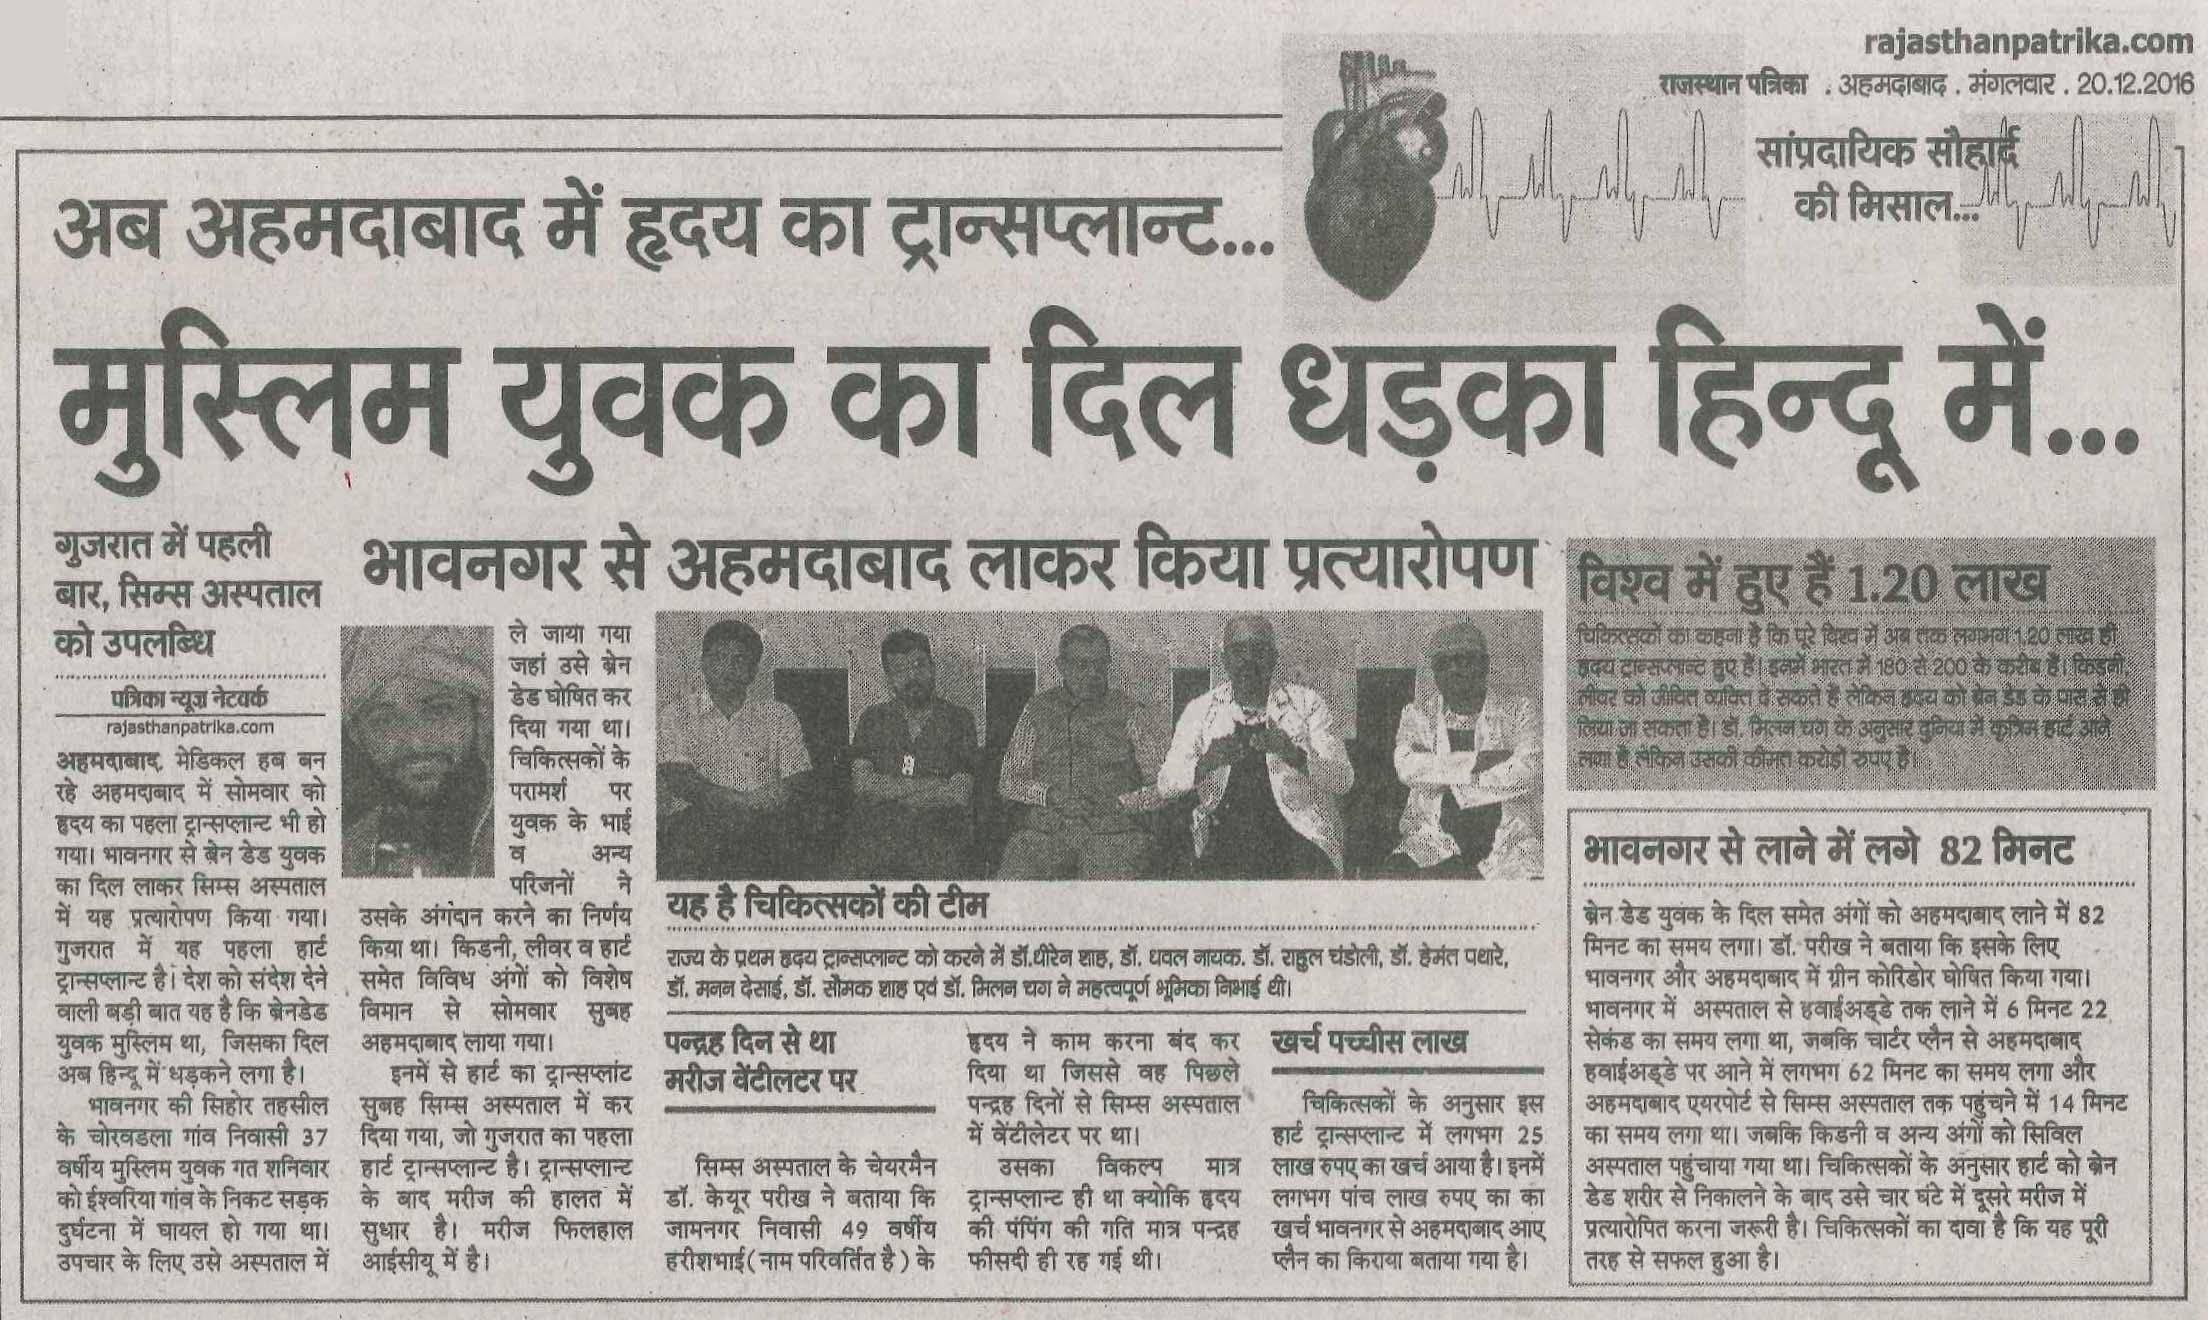 Rajasthan Patrika (Ahd)_CIMS (1st Heart transplant in Gujarat)_20.12.16_Pg 03